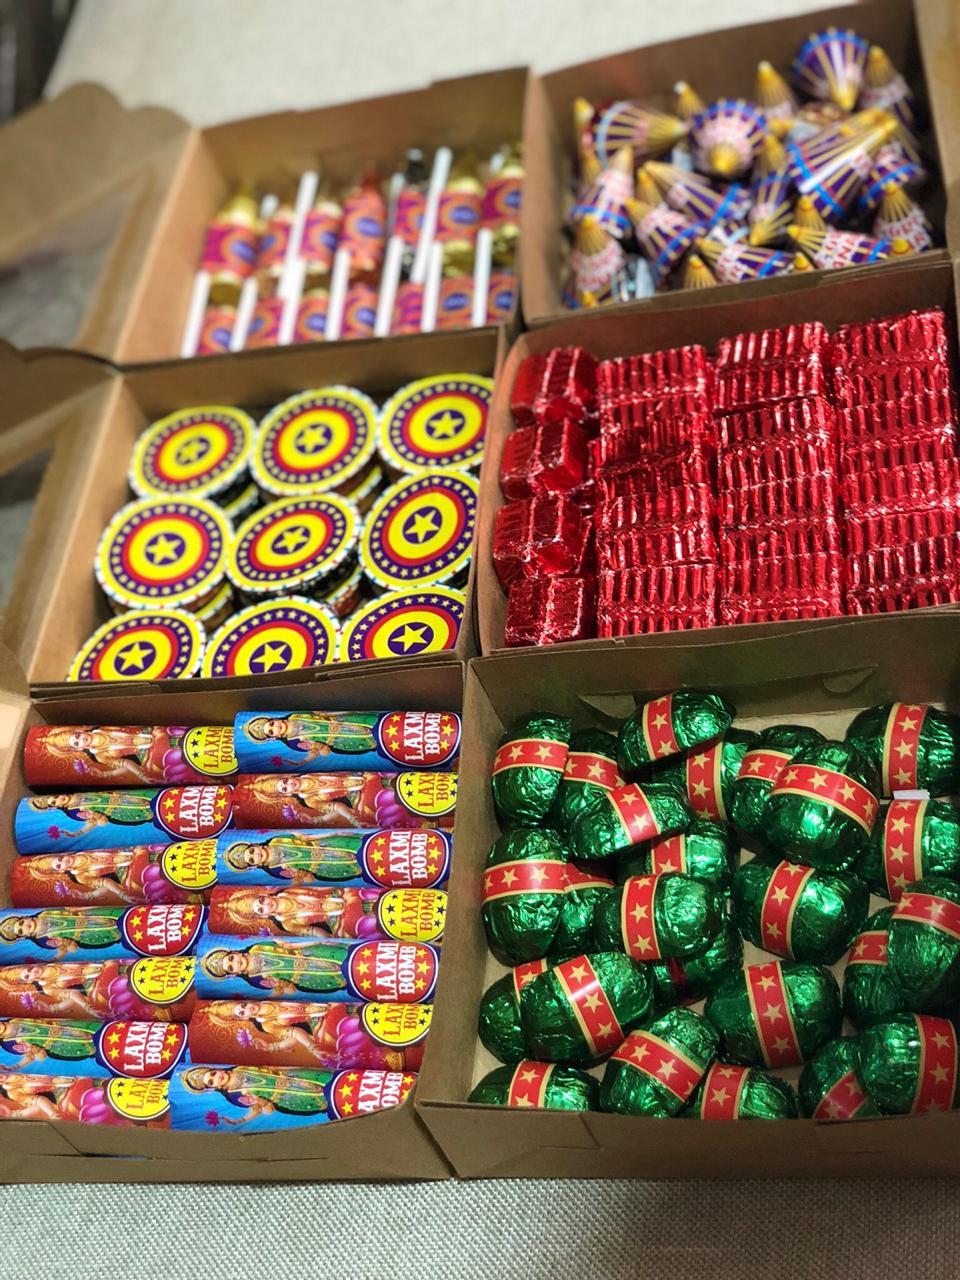 Firecracker chocolates for Diwali